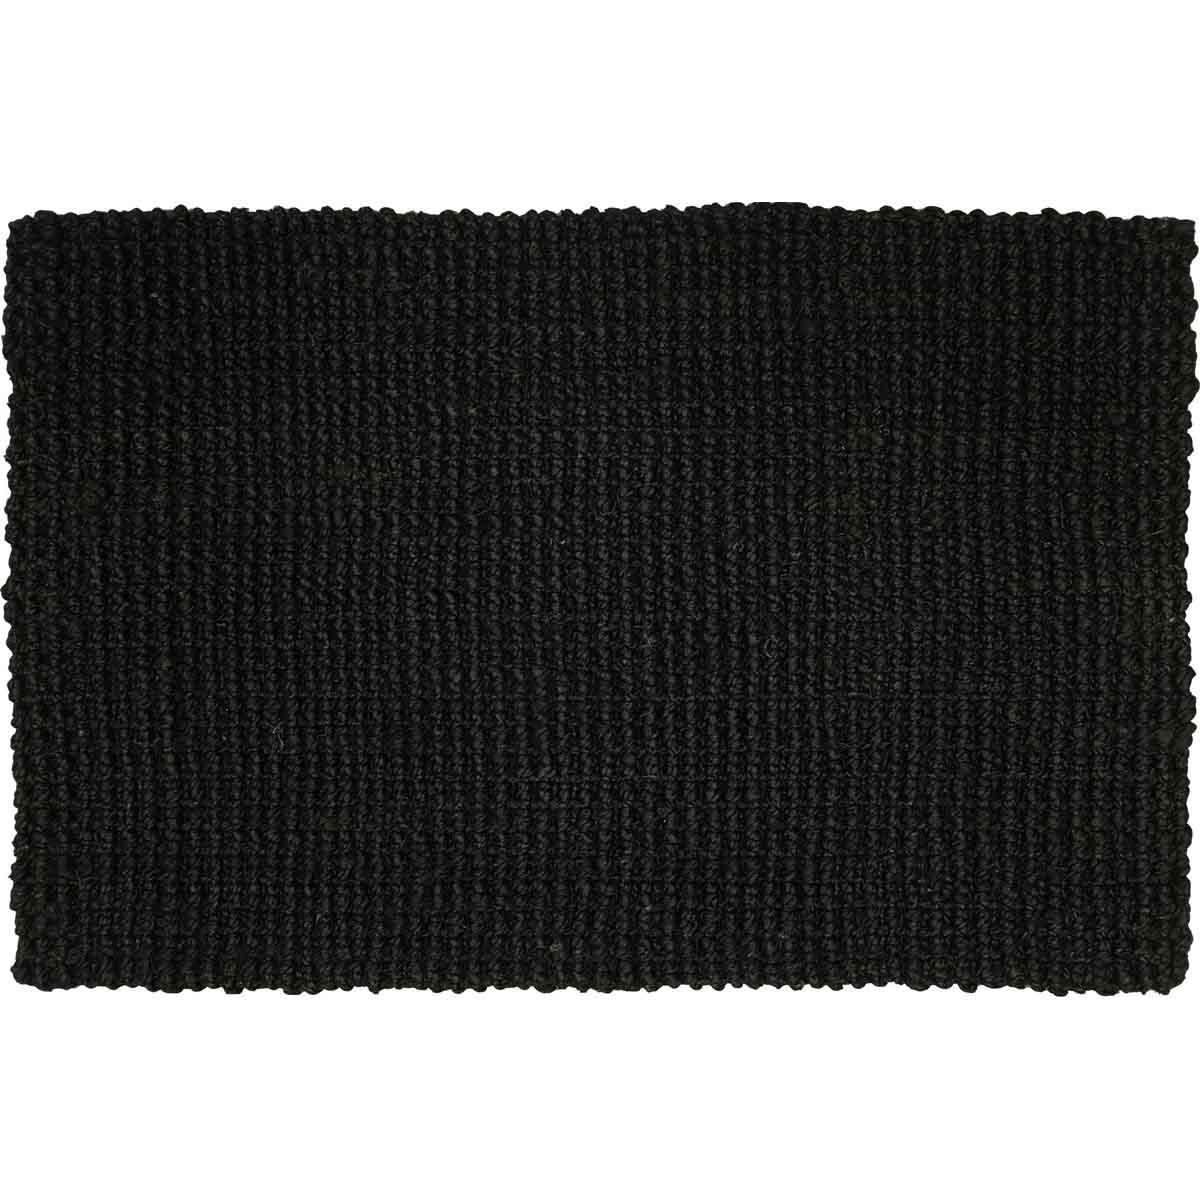 Skåne dörrmatta jute svart 50x80